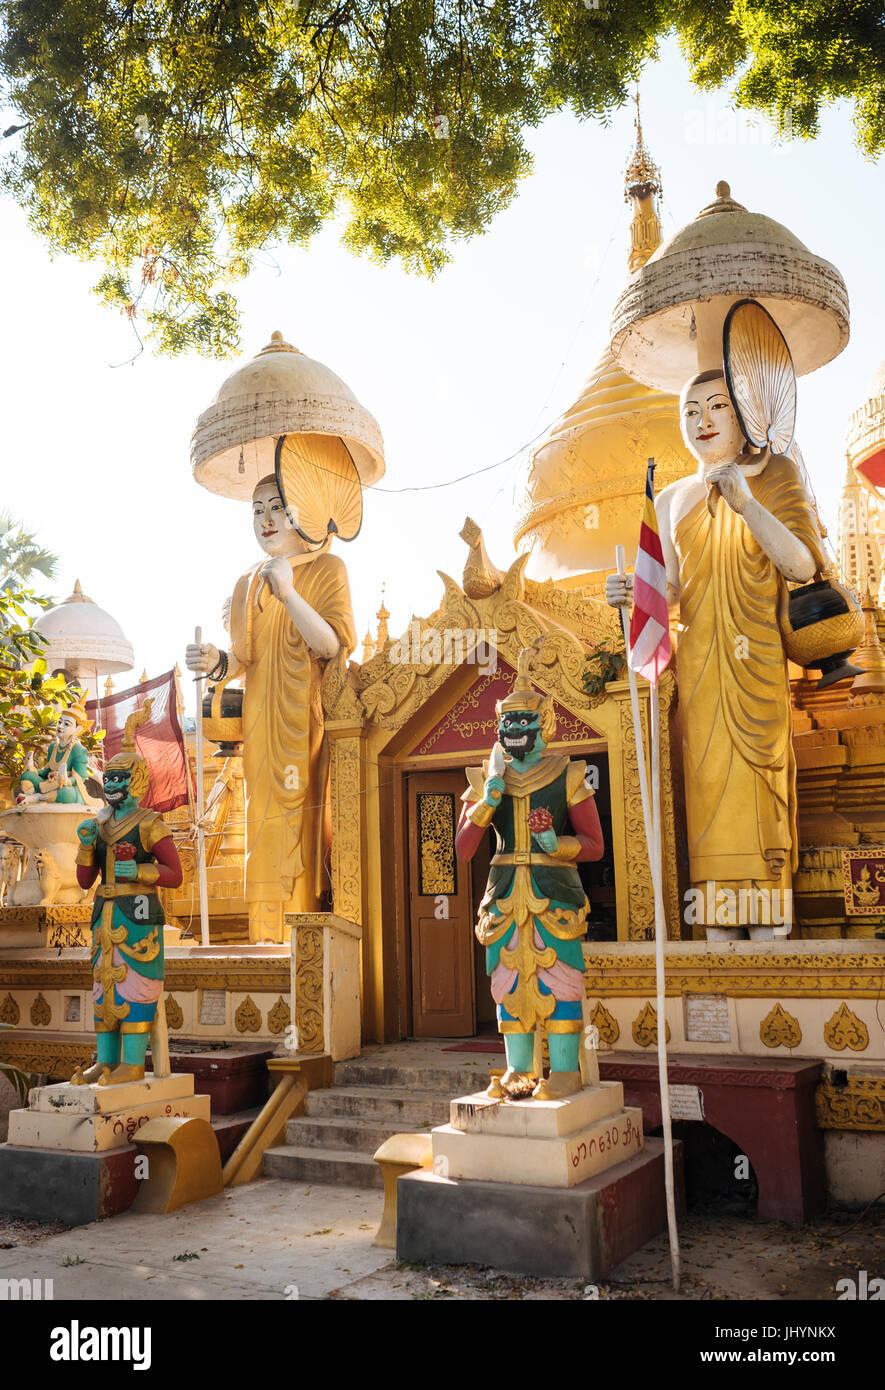 Buddhist Temple, Amarapura, Mandalay, Mandalay Region, Myanmar (Burma), Asia - Stock Image